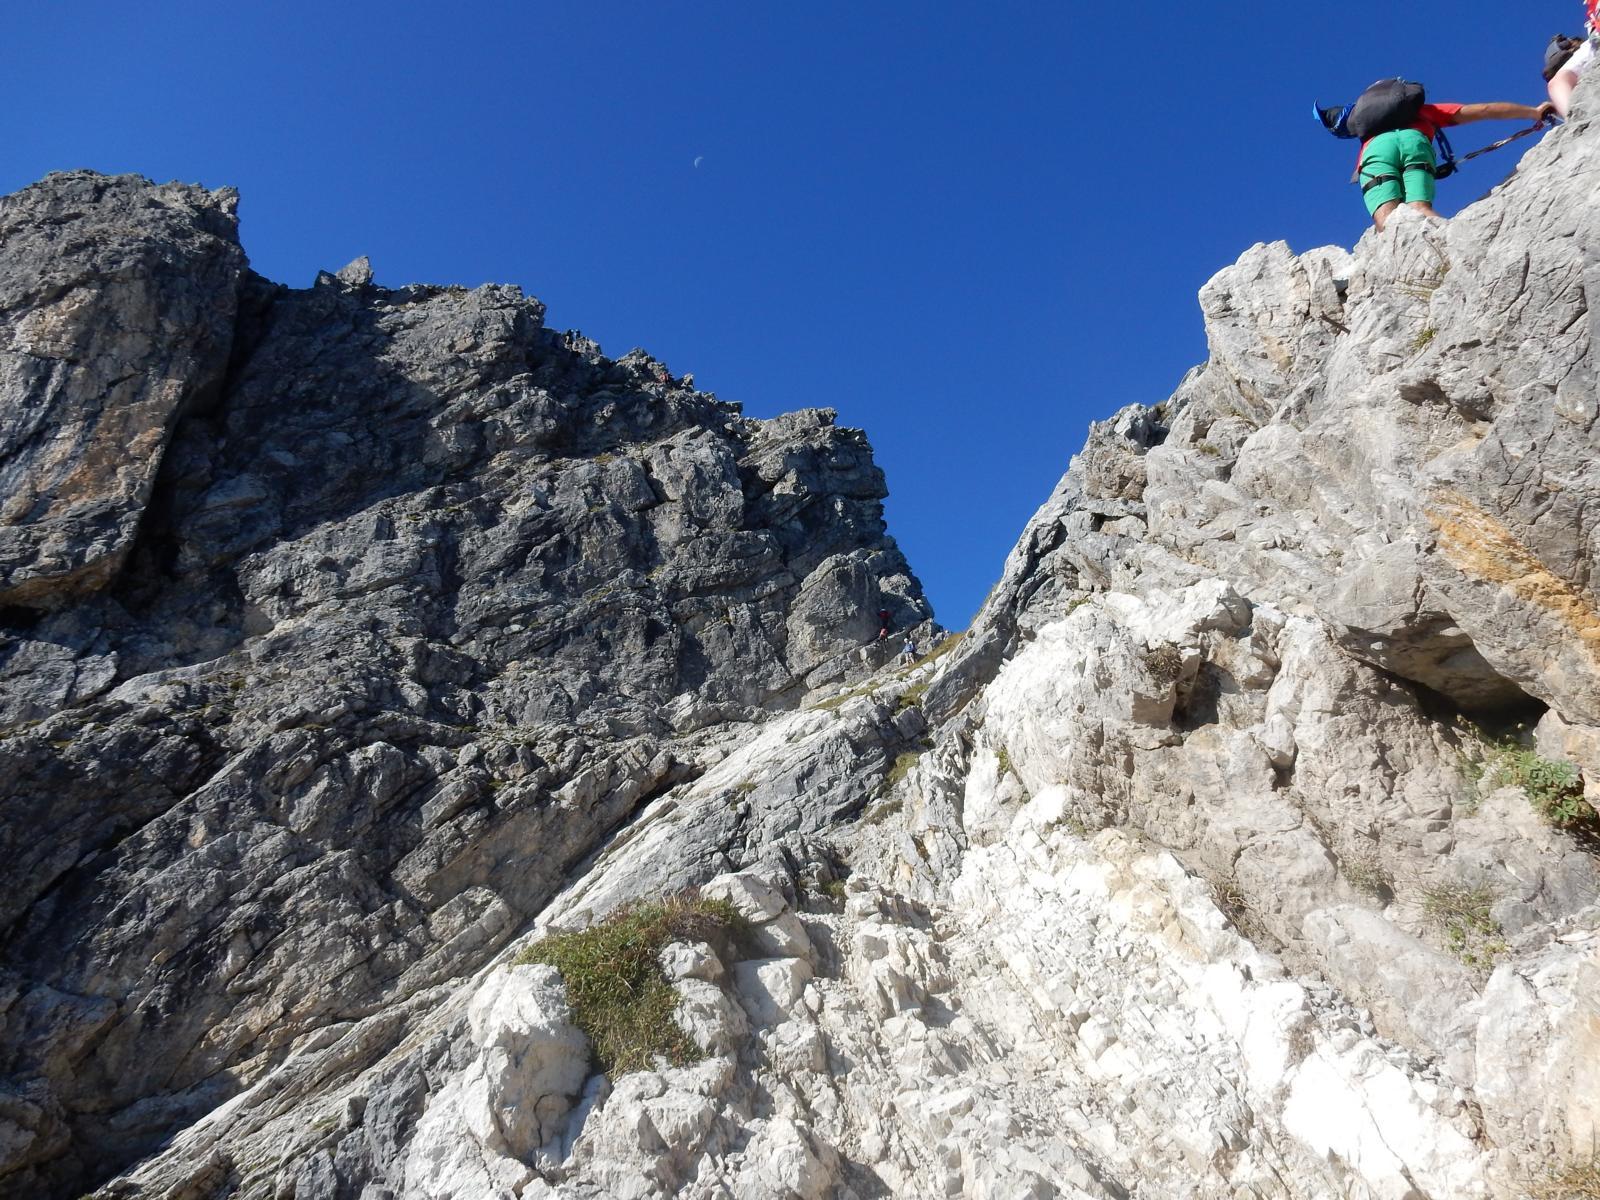 Beginn des Mindelheimer Klettersteigs